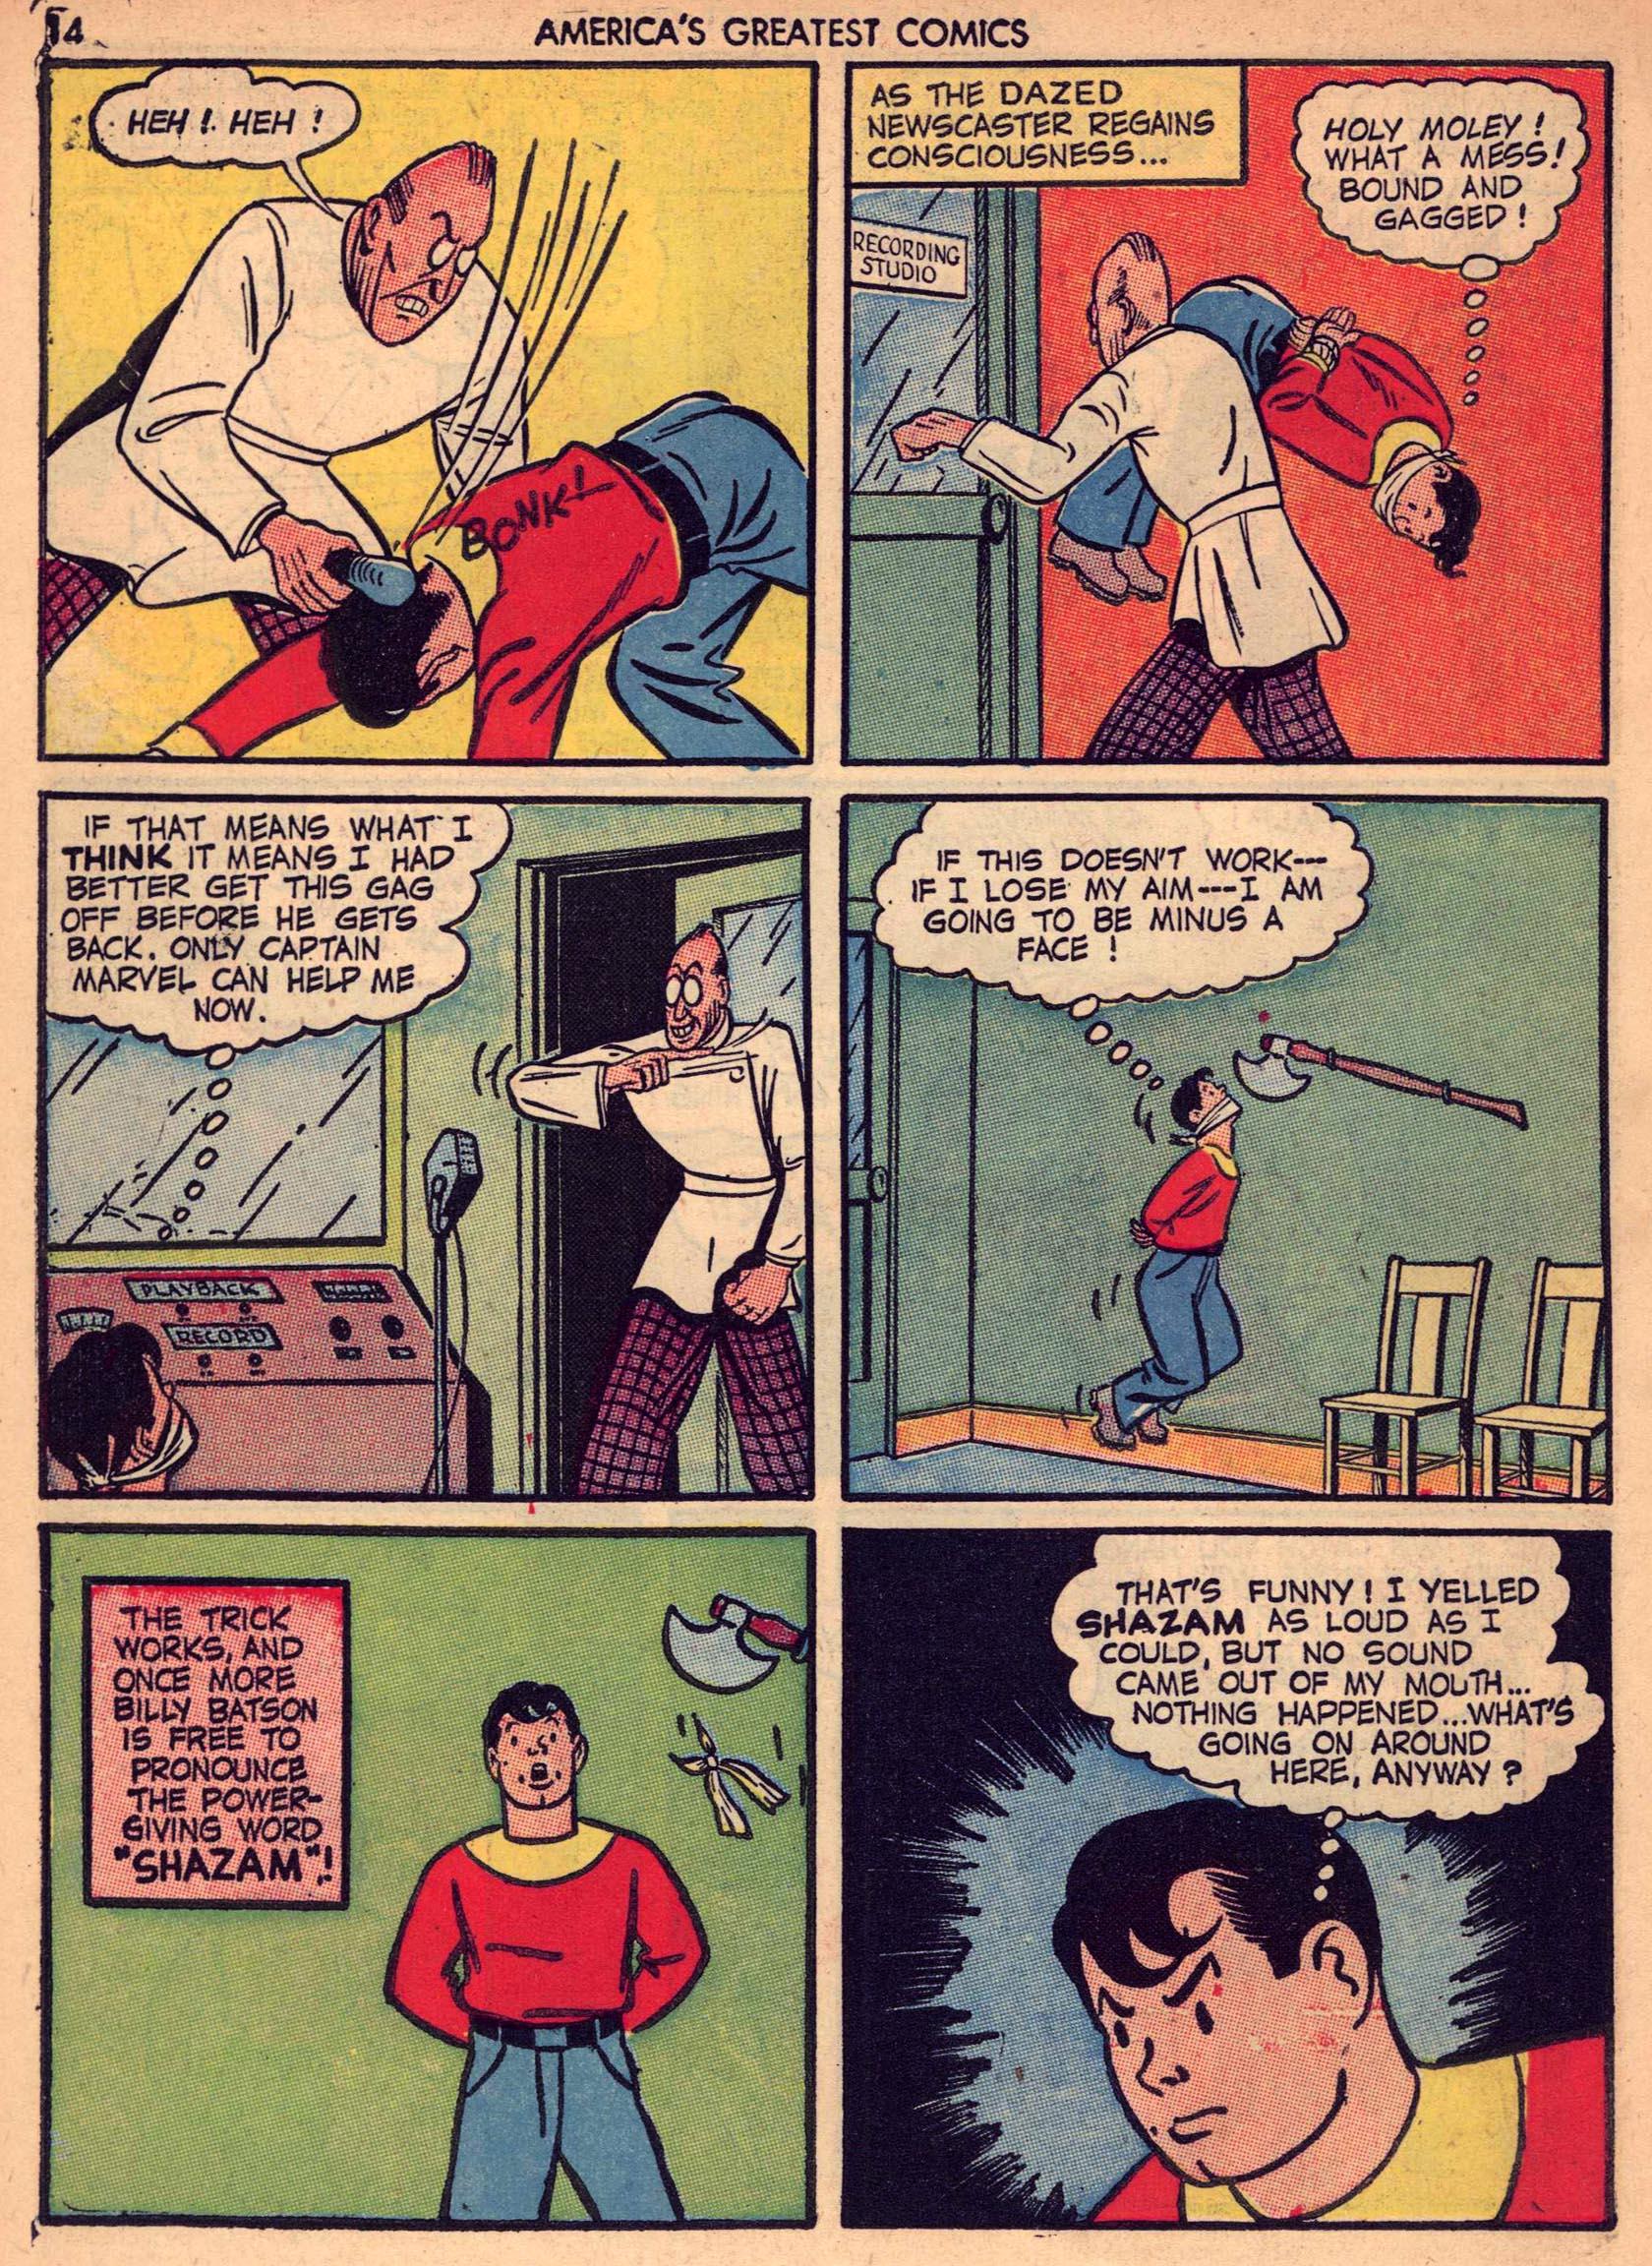 Read online America's Greatest Comics comic -  Issue #7 - 13